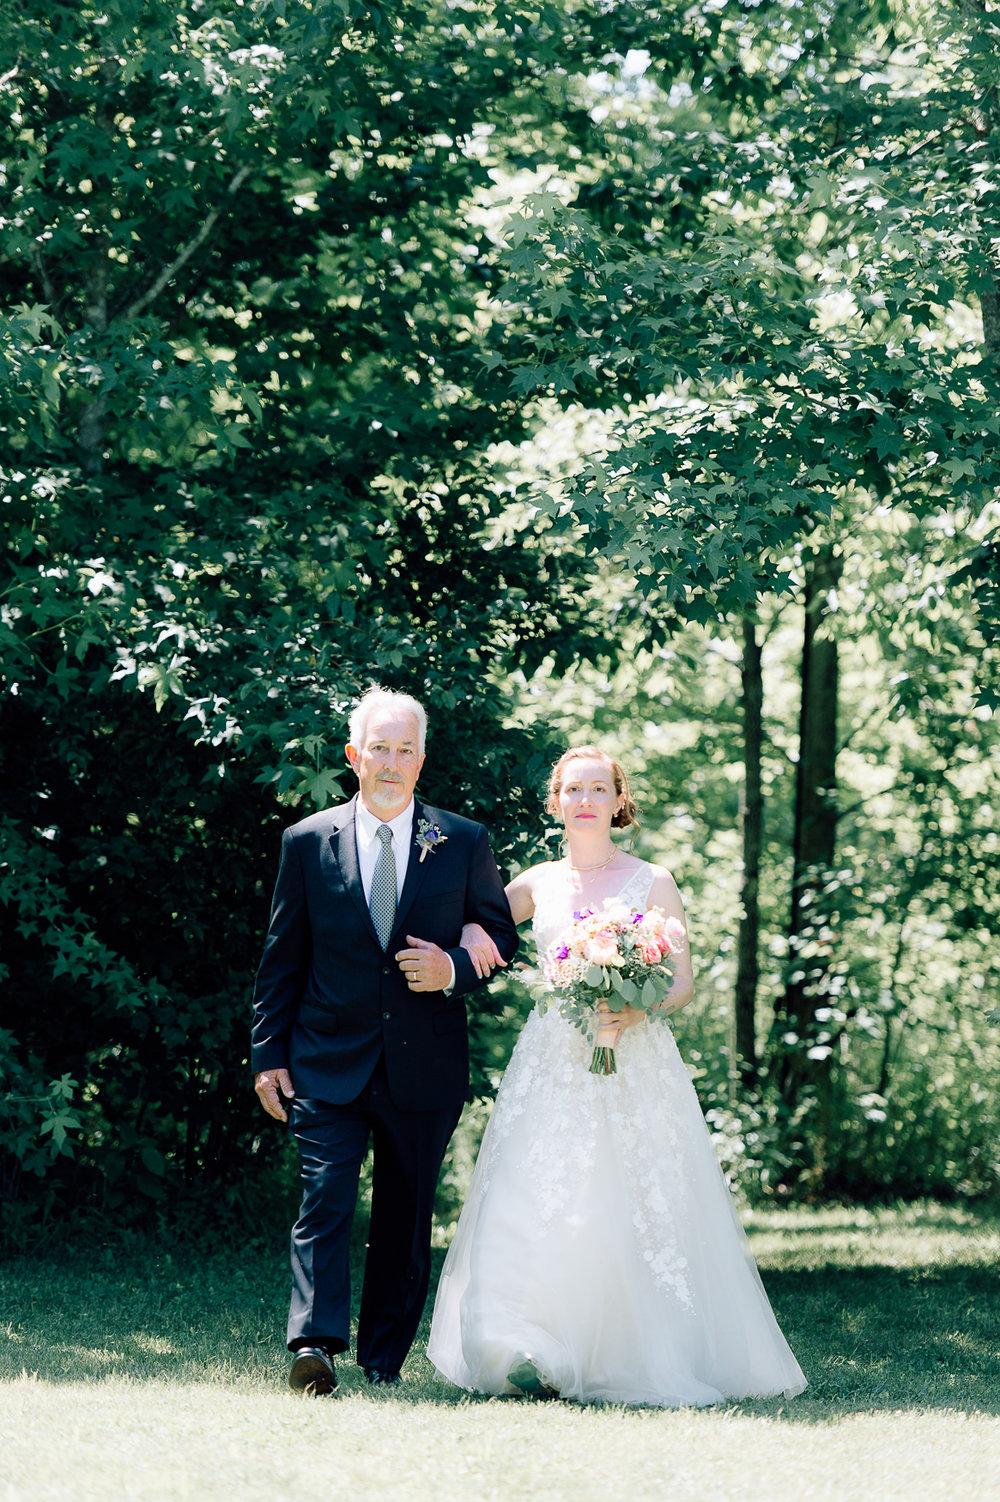 virginiawedding_theGlasgowFarm_rusticwedding_fredericksburg_youseephotography_CarolineDale (36).jpg